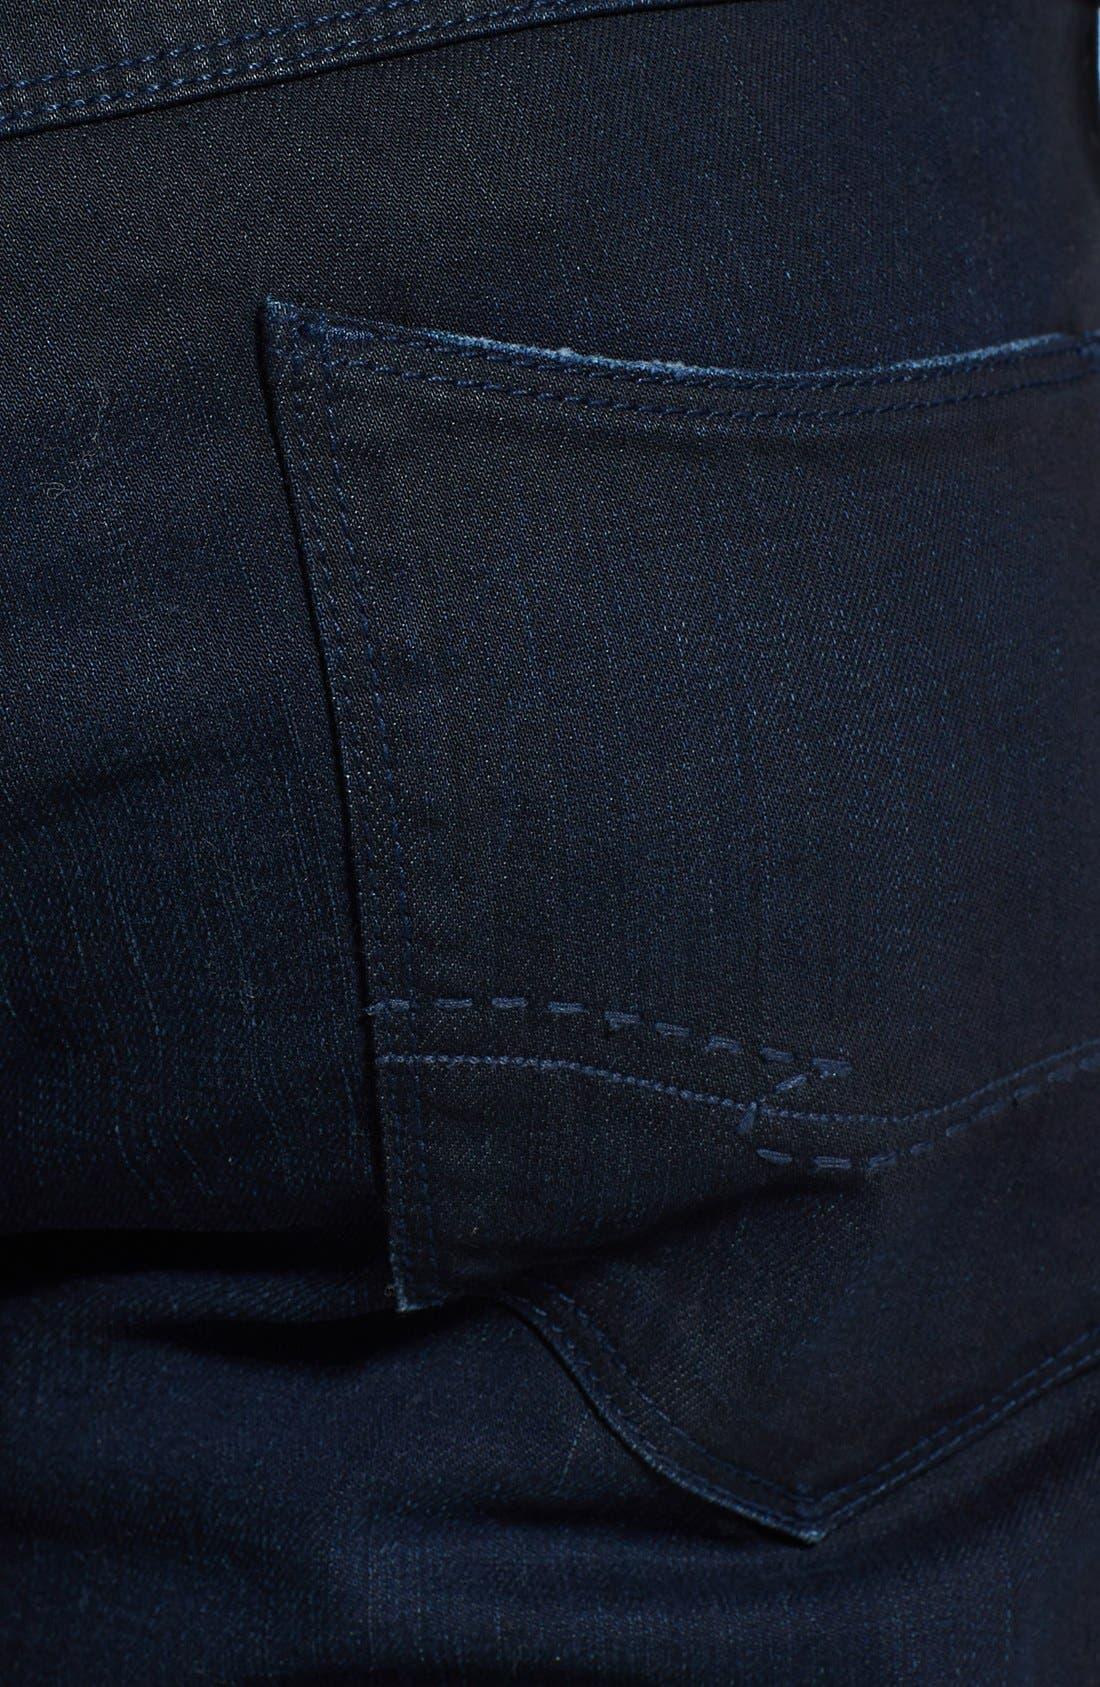 Alternate Image 3  - Robert Graham 'Rocker' Slim Fit Stretch Pants